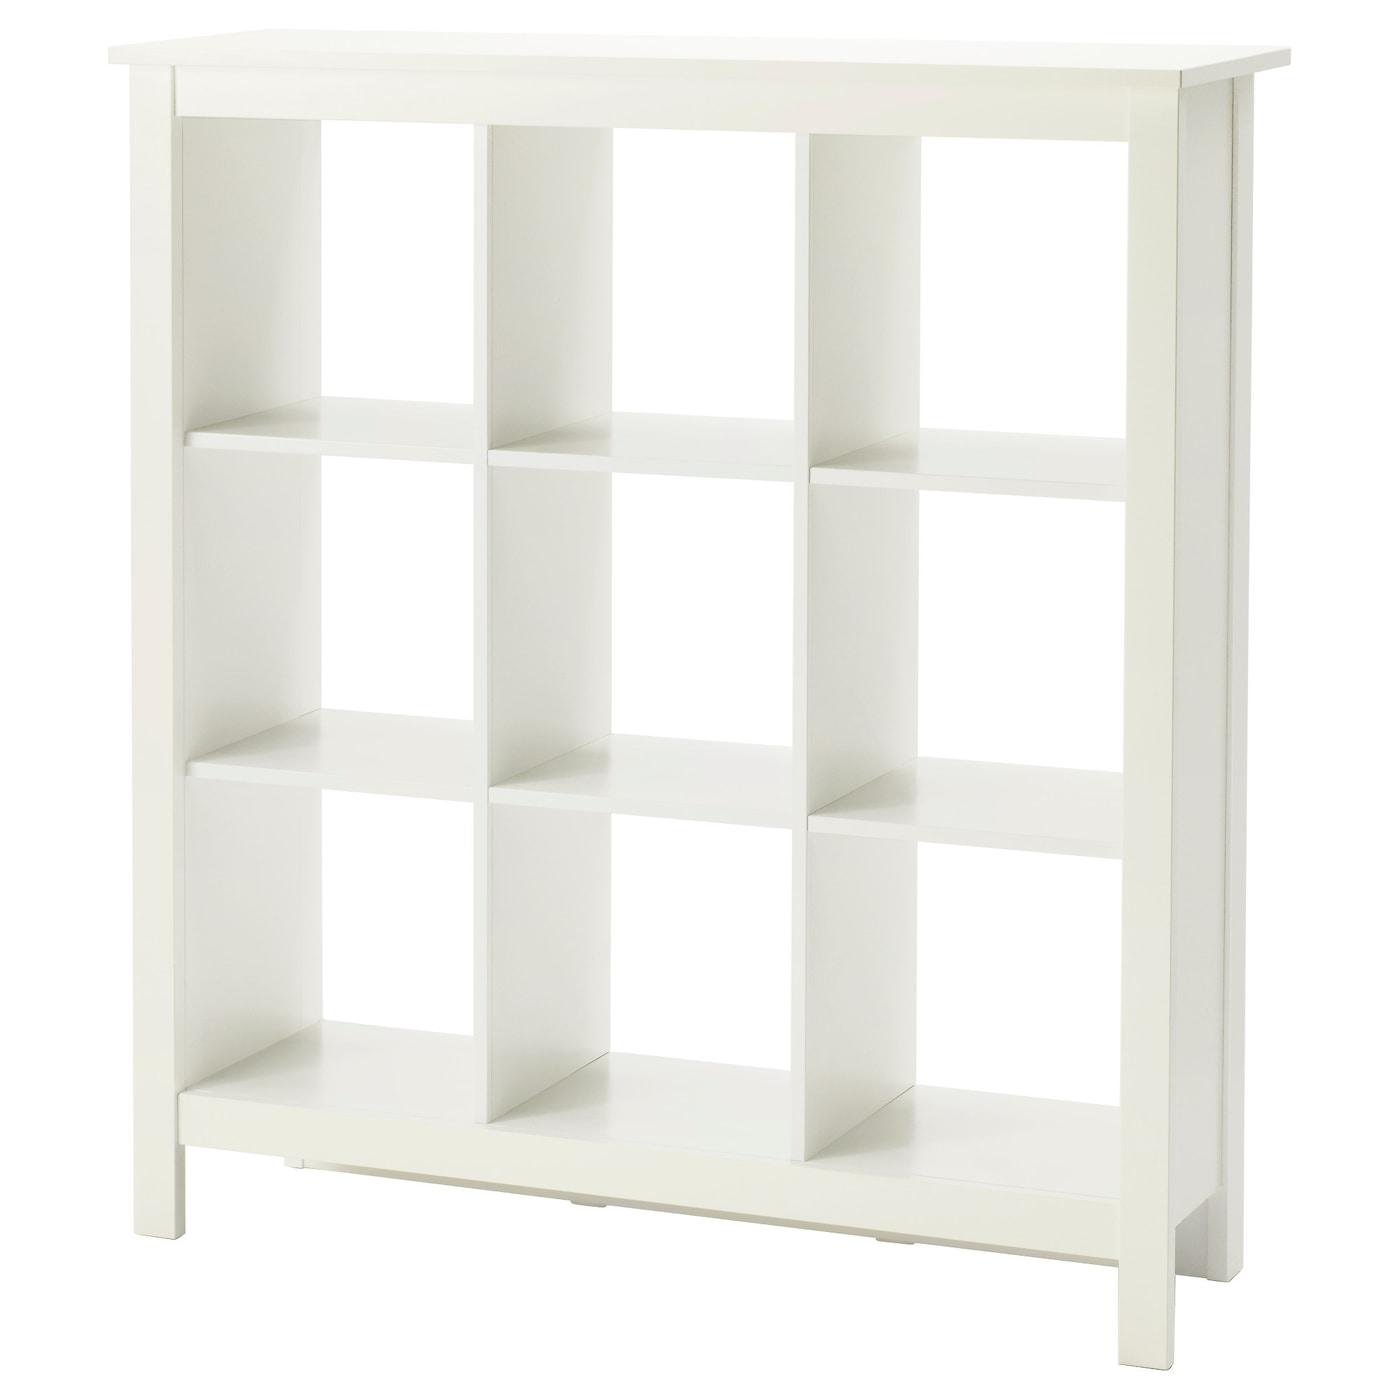 shelving units systems ikea ireland. Black Bedroom Furniture Sets. Home Design Ideas